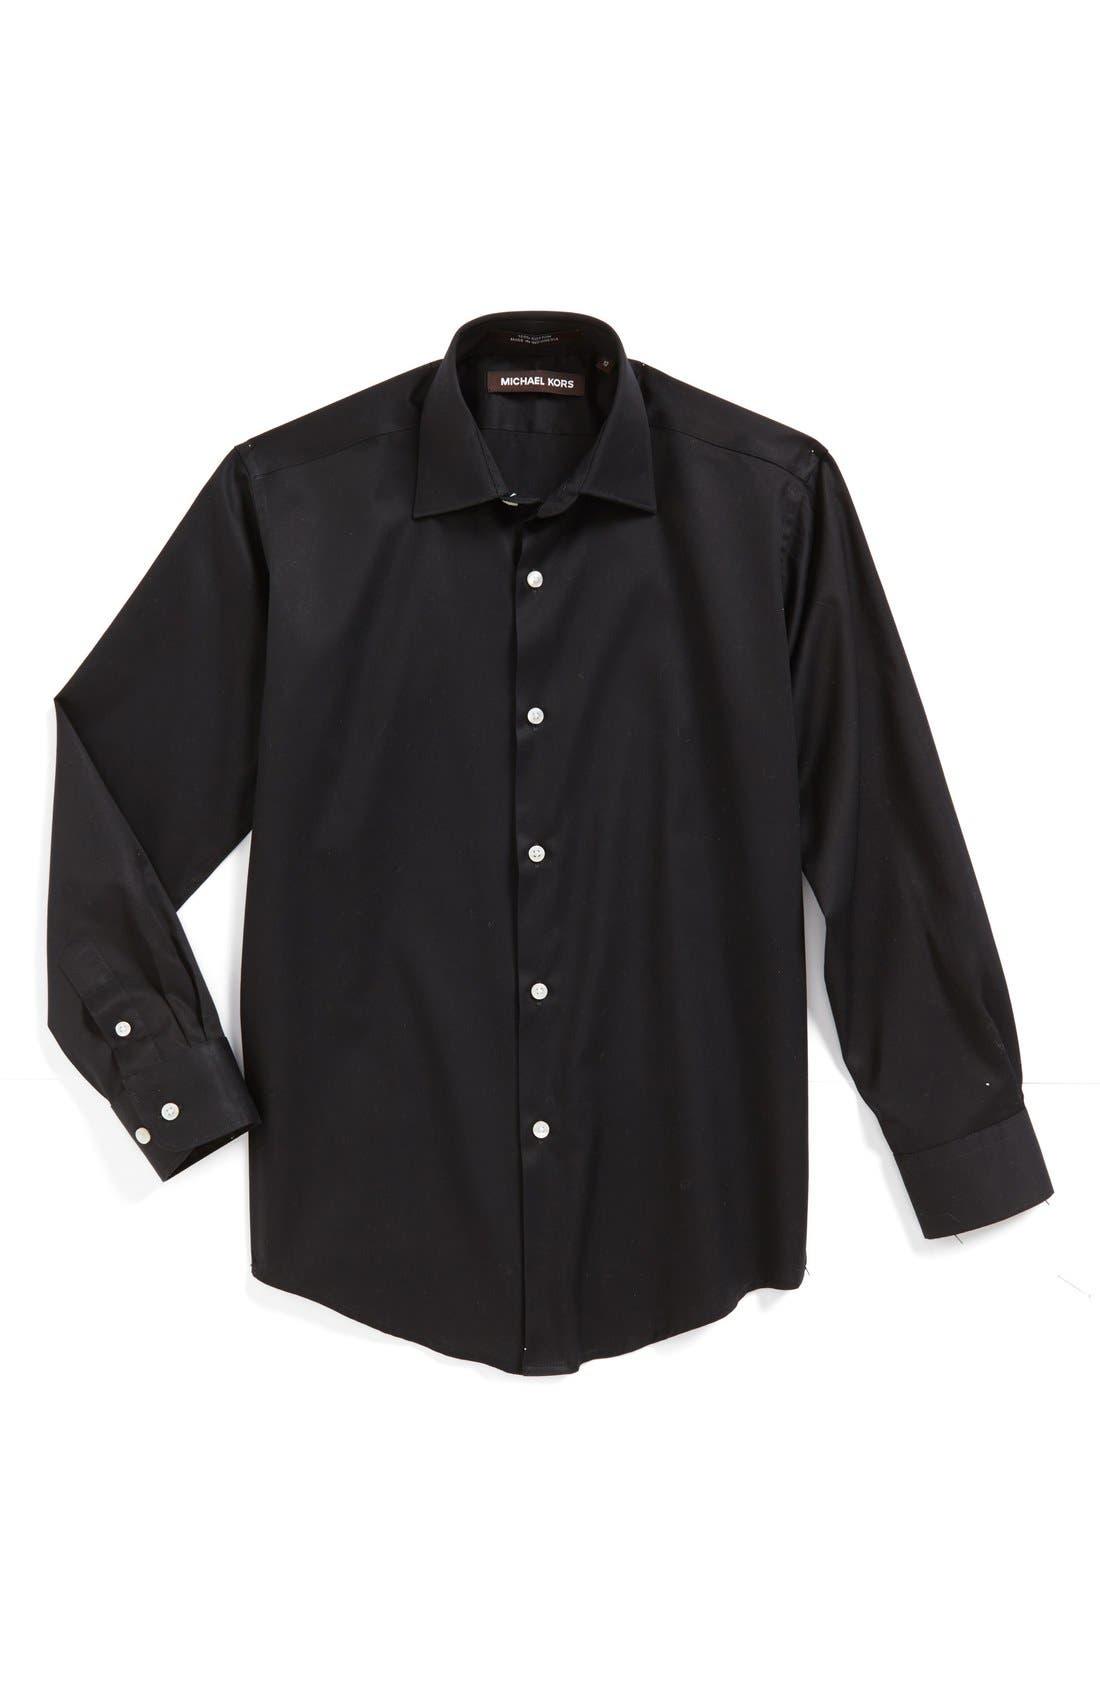 MICHAEL KORS, Solid Dress Shirt, Main thumbnail 1, color, BLACK